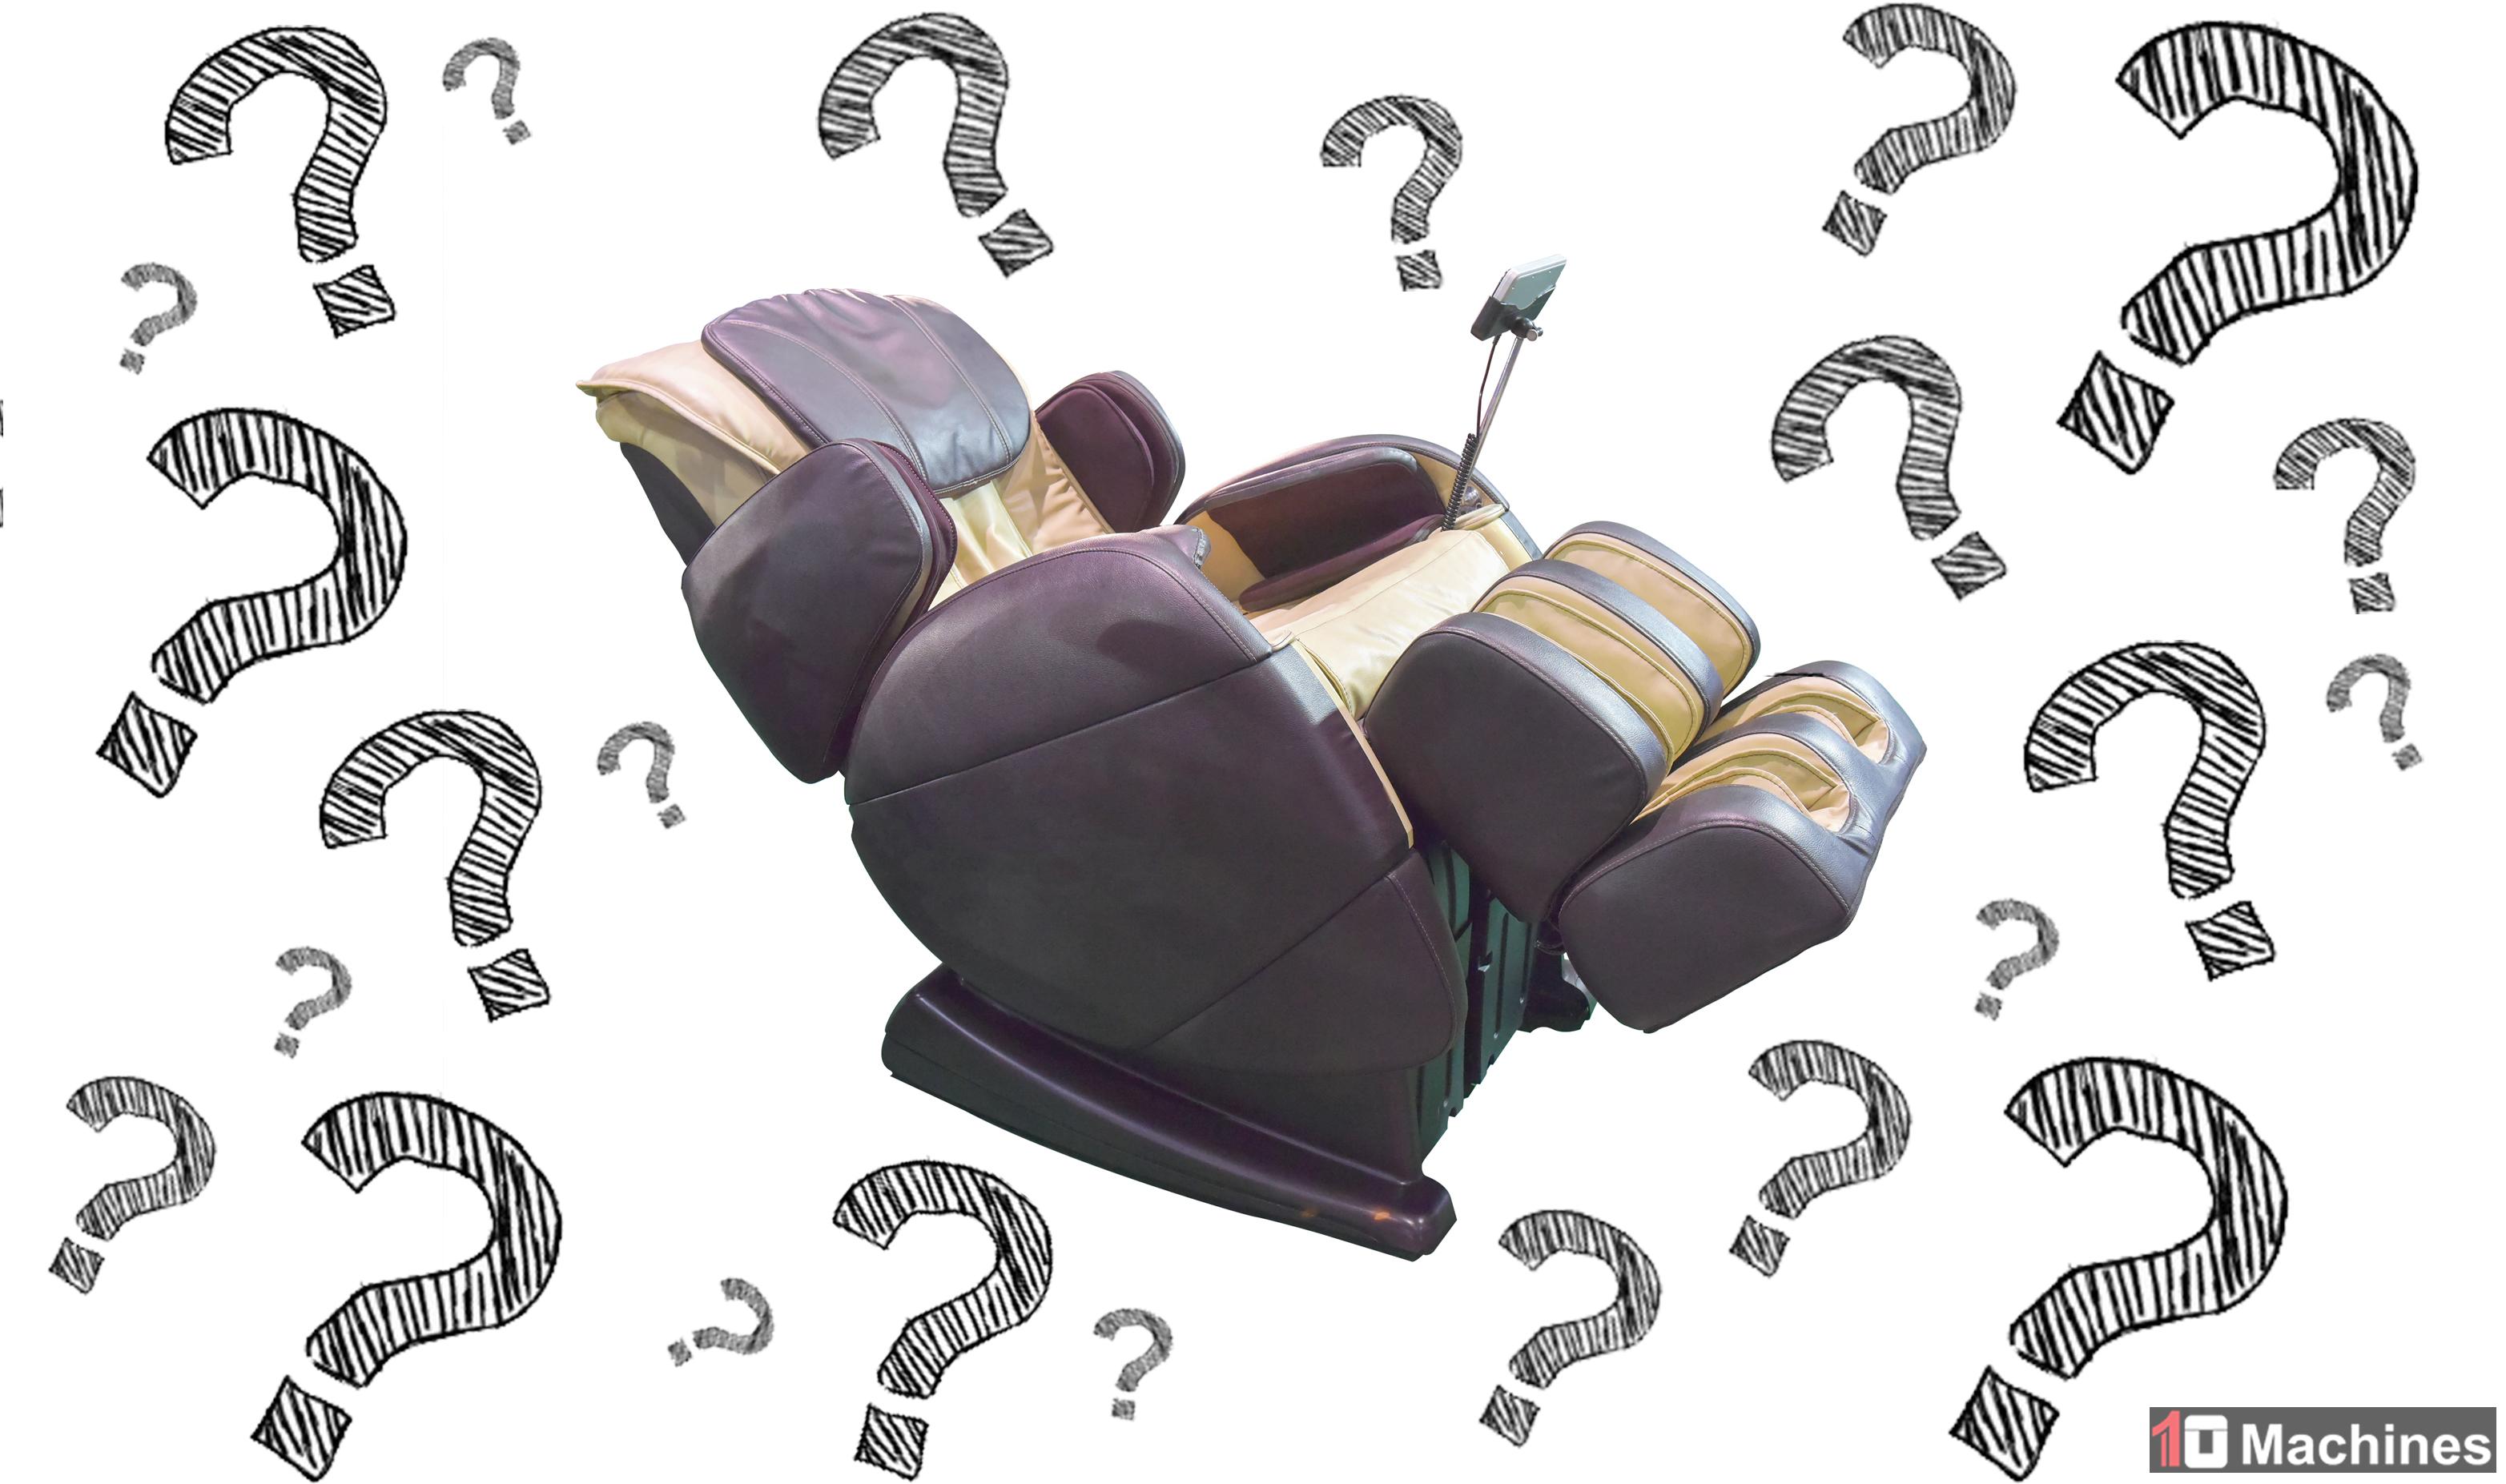 chair gym reviews 2018 office mat massage questions   10 machines